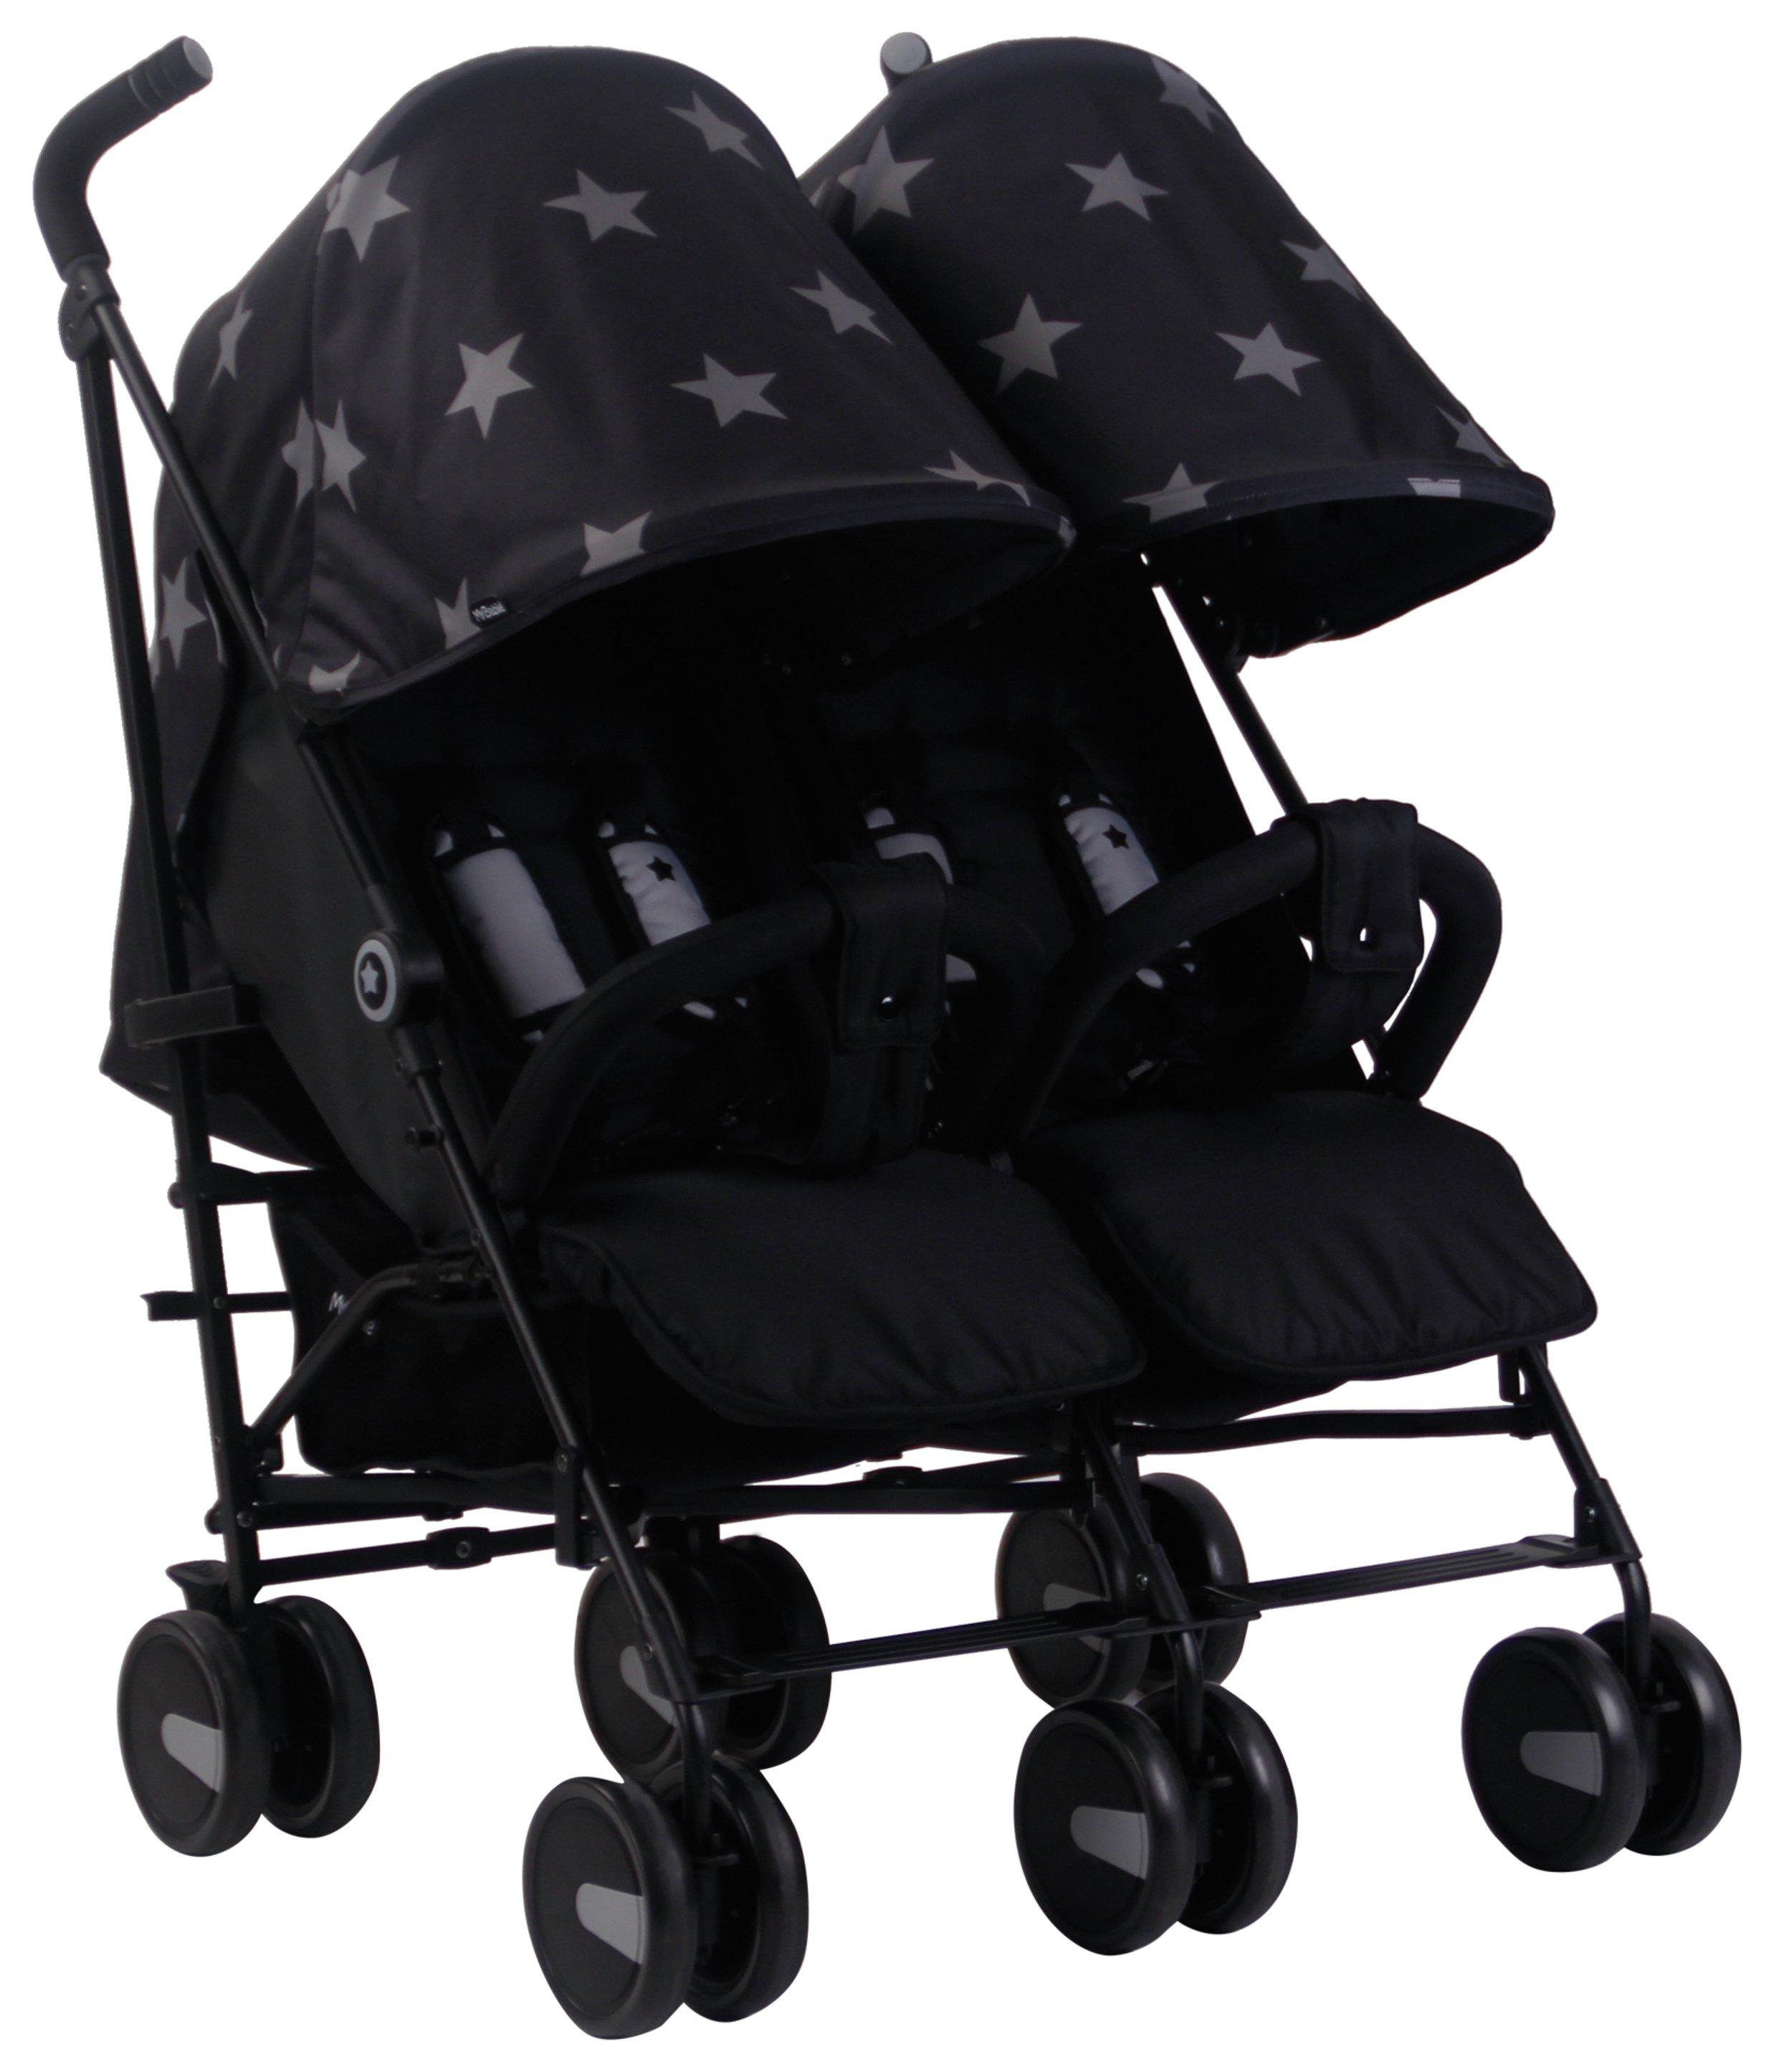 My Babiie MB22 Stars Double Pushchair - Black